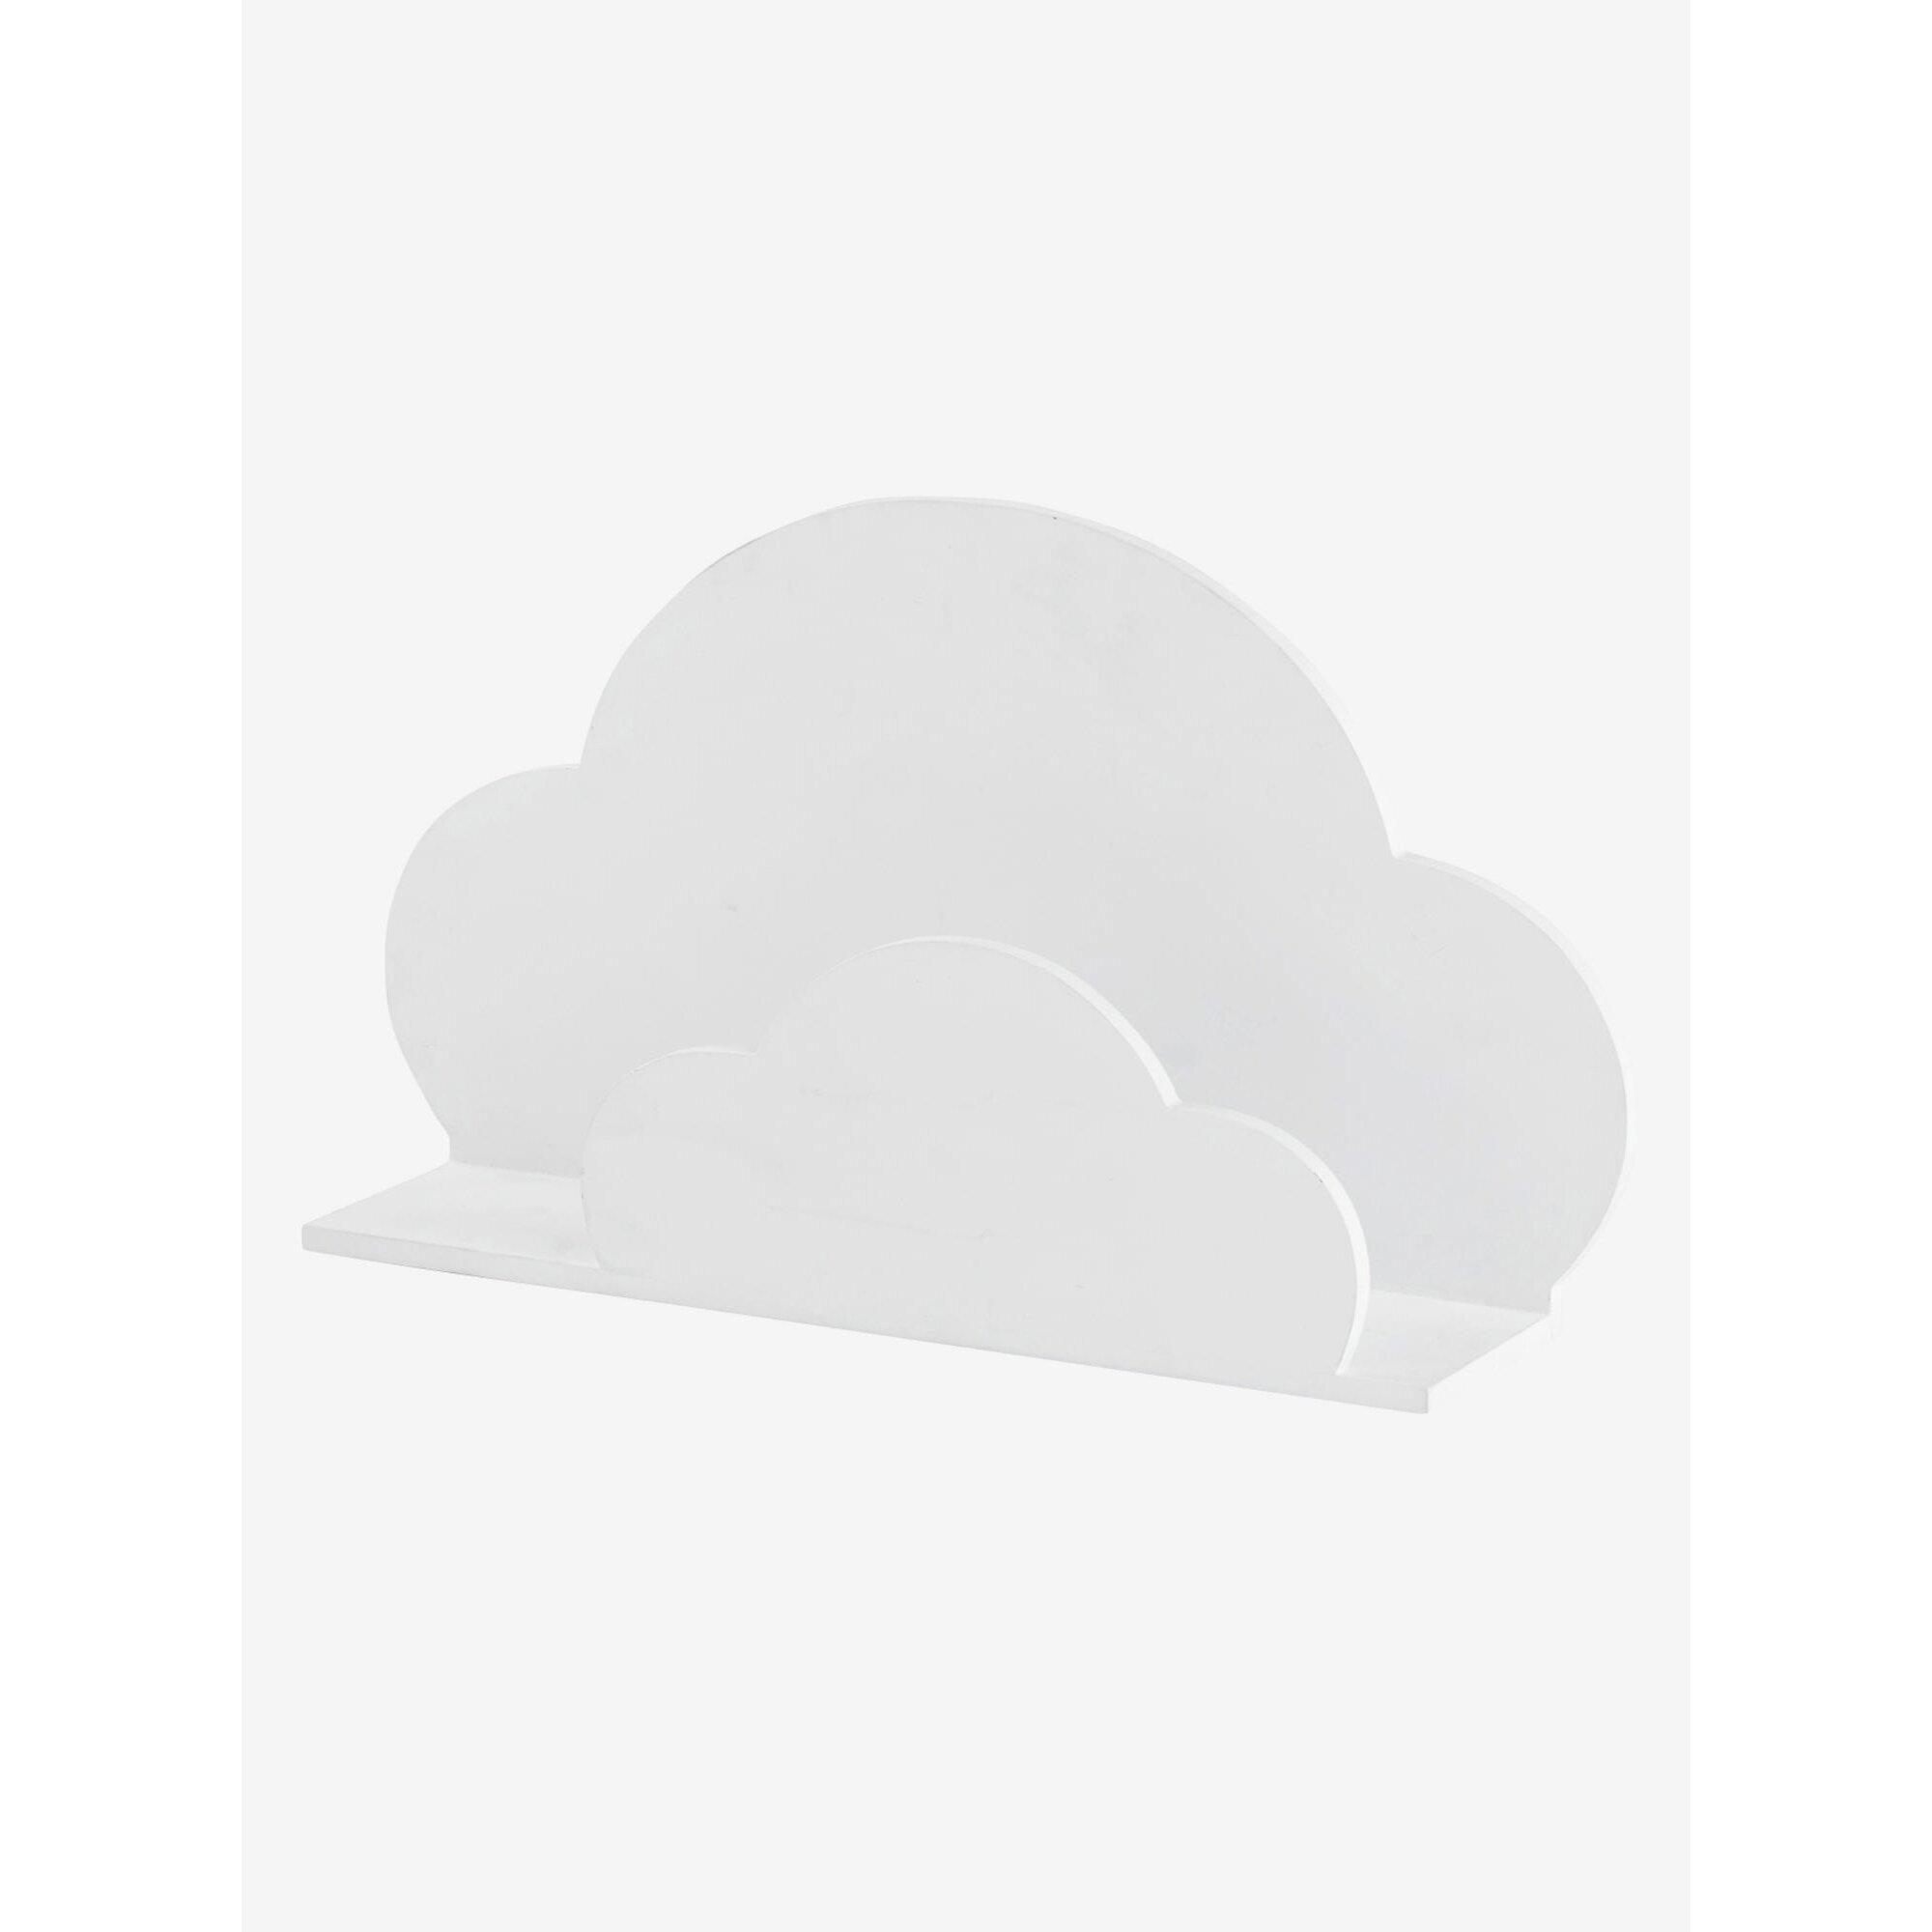 vertbaudet-wandregal-wolke-fur-babyzimmer, 30.99 EUR @ babywalz-de